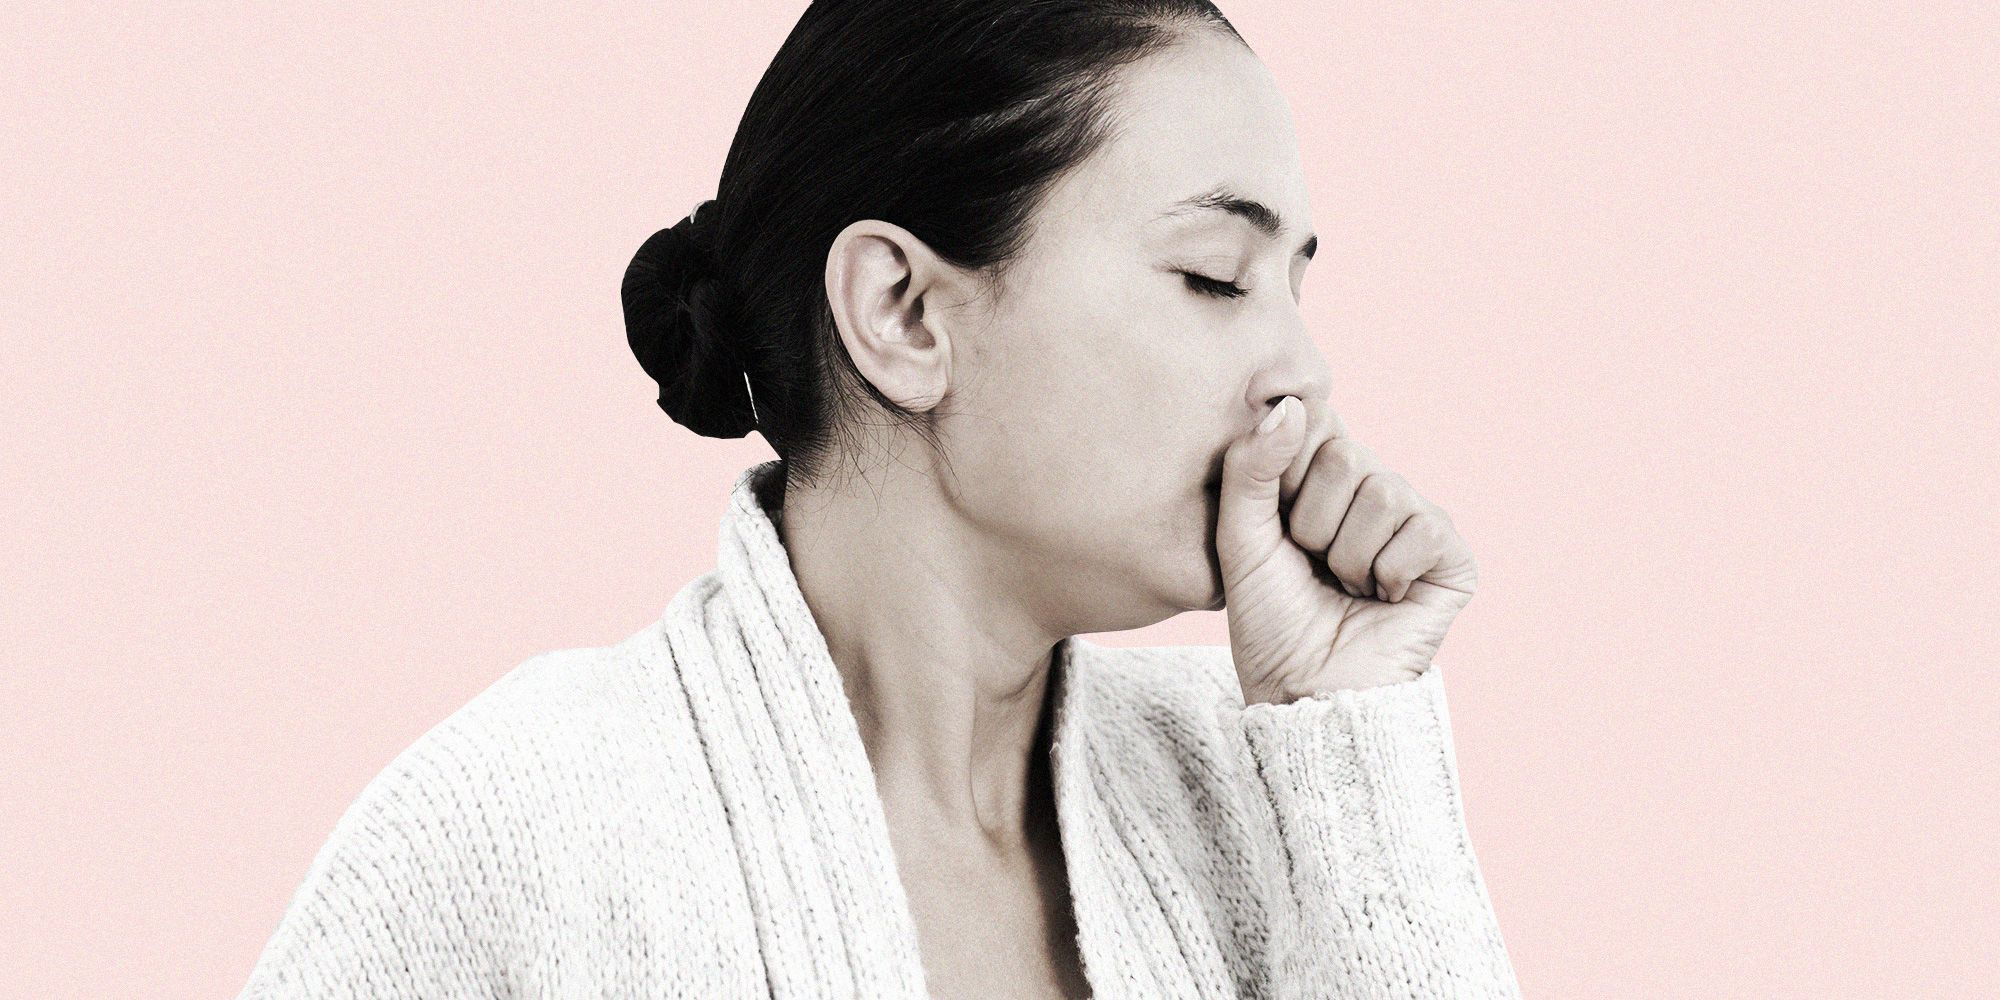 Why do i keep feeling sick and burping